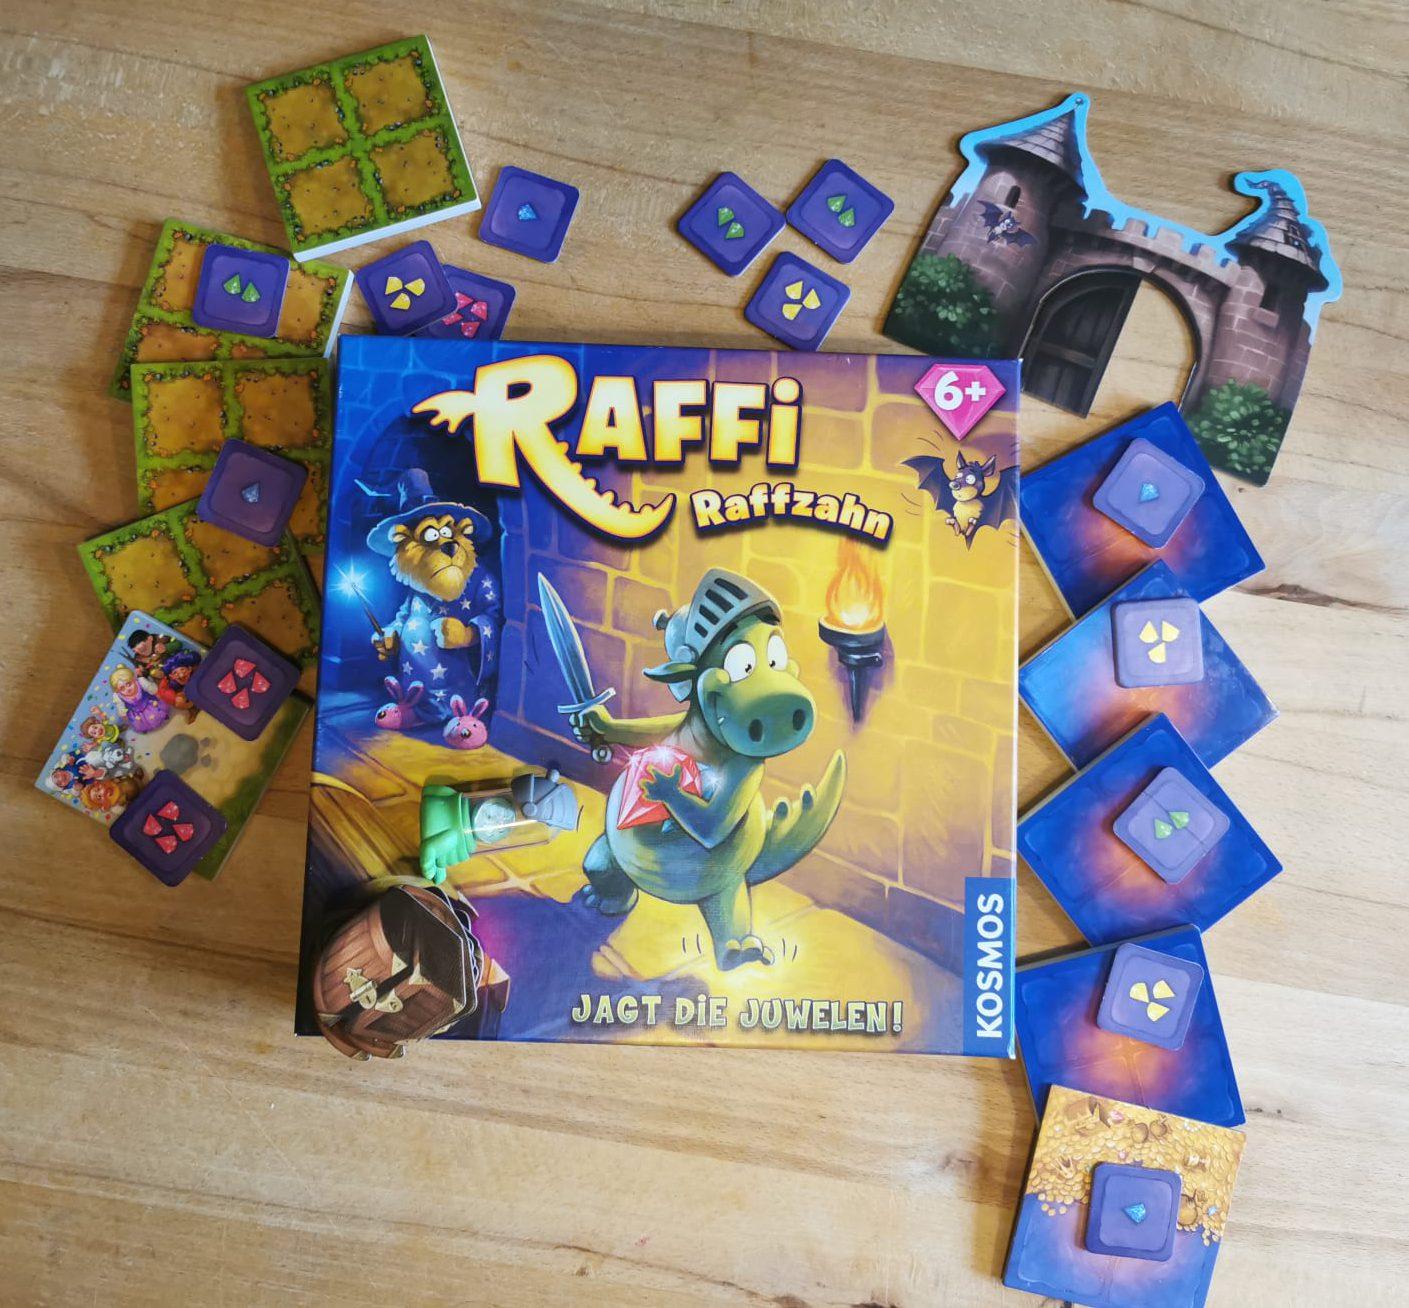 Raffi Raffzahn Spielmaterial